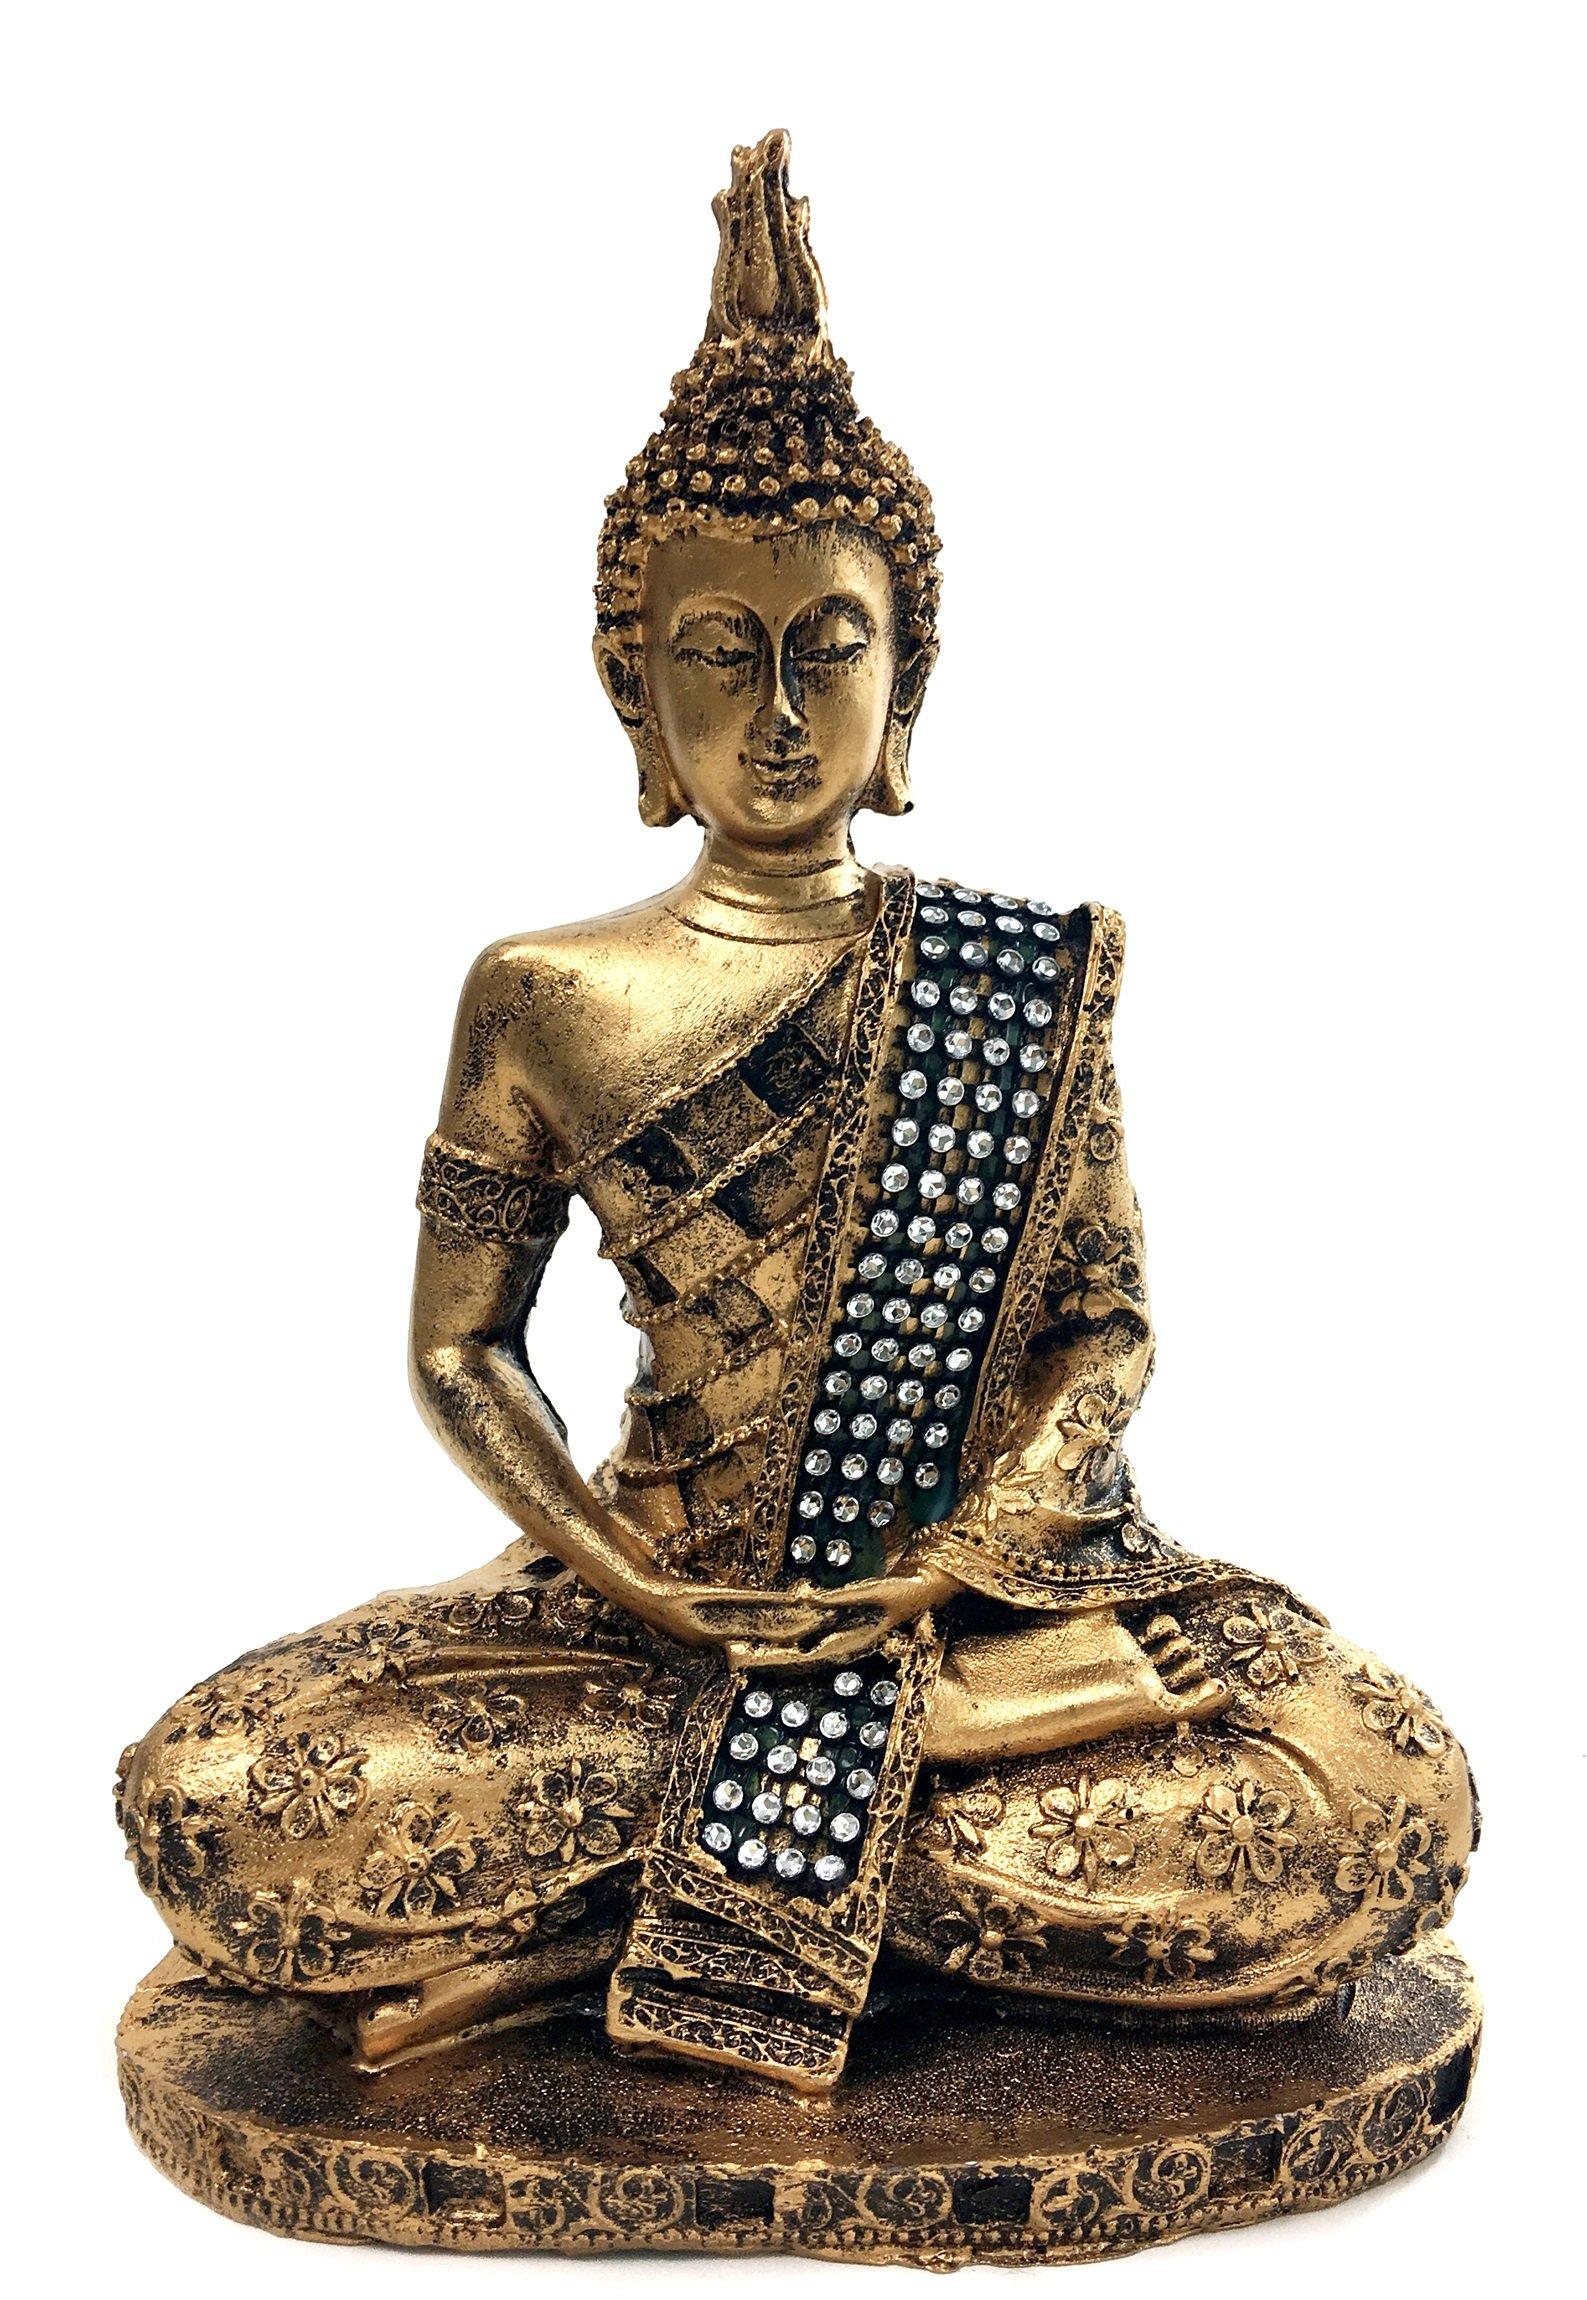 bombayjewel Thai Buddha Meditating Peace Harmony Statue, 8''H by bombayjewel